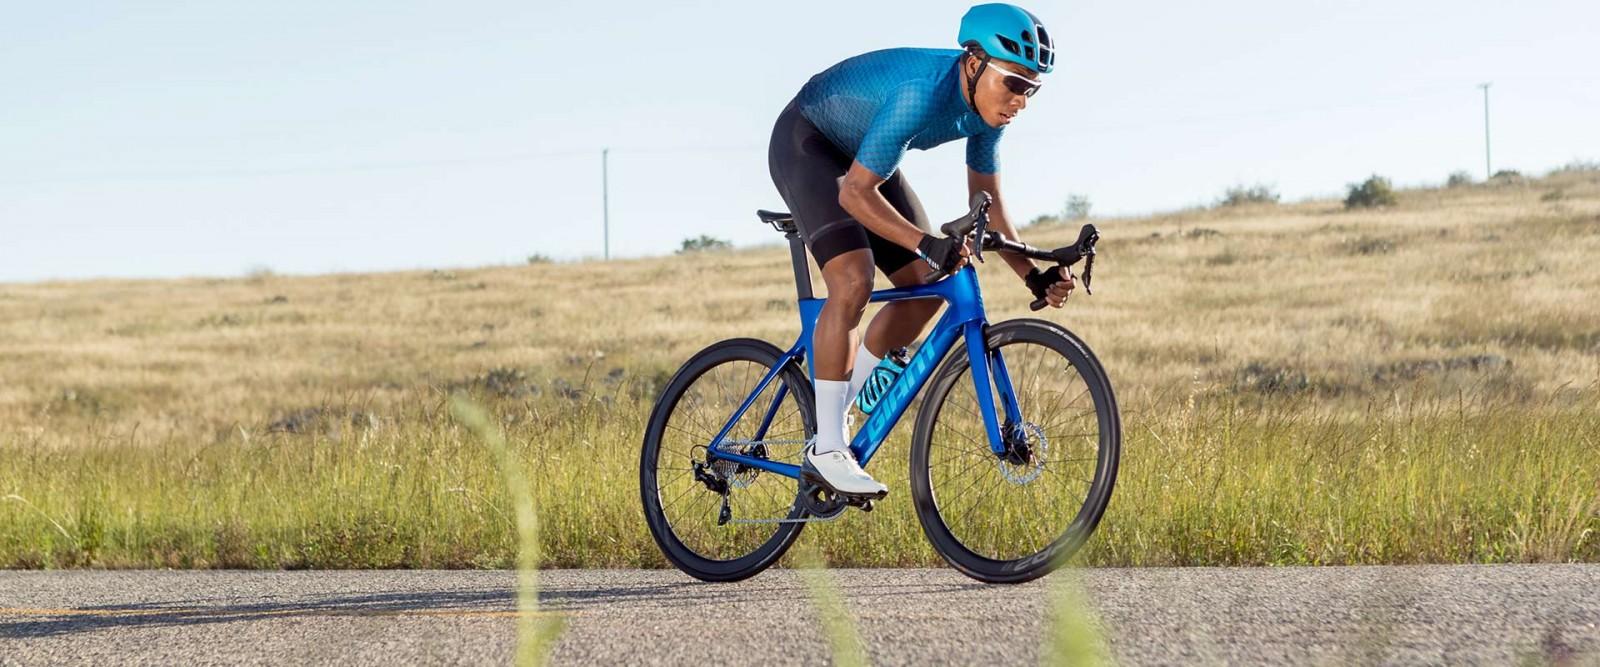 velocidad-media-bicicleta/